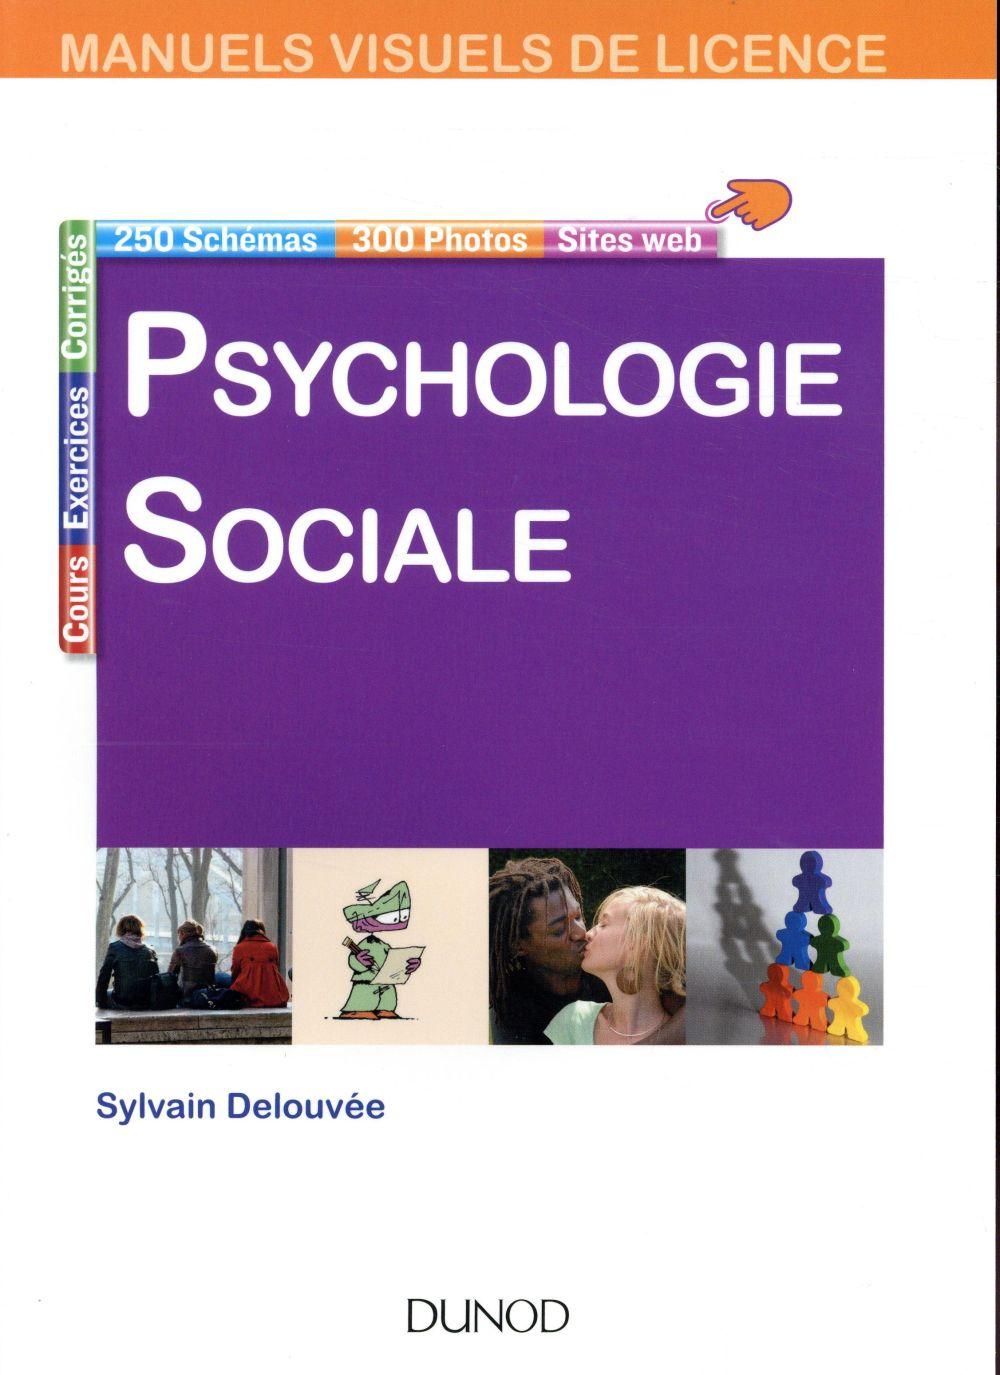 MANUEL VISUEL DE PSYCHOLOGIE SOCIALE (3E EDITION) DELOUVEE, SYLVAIN DUNOD